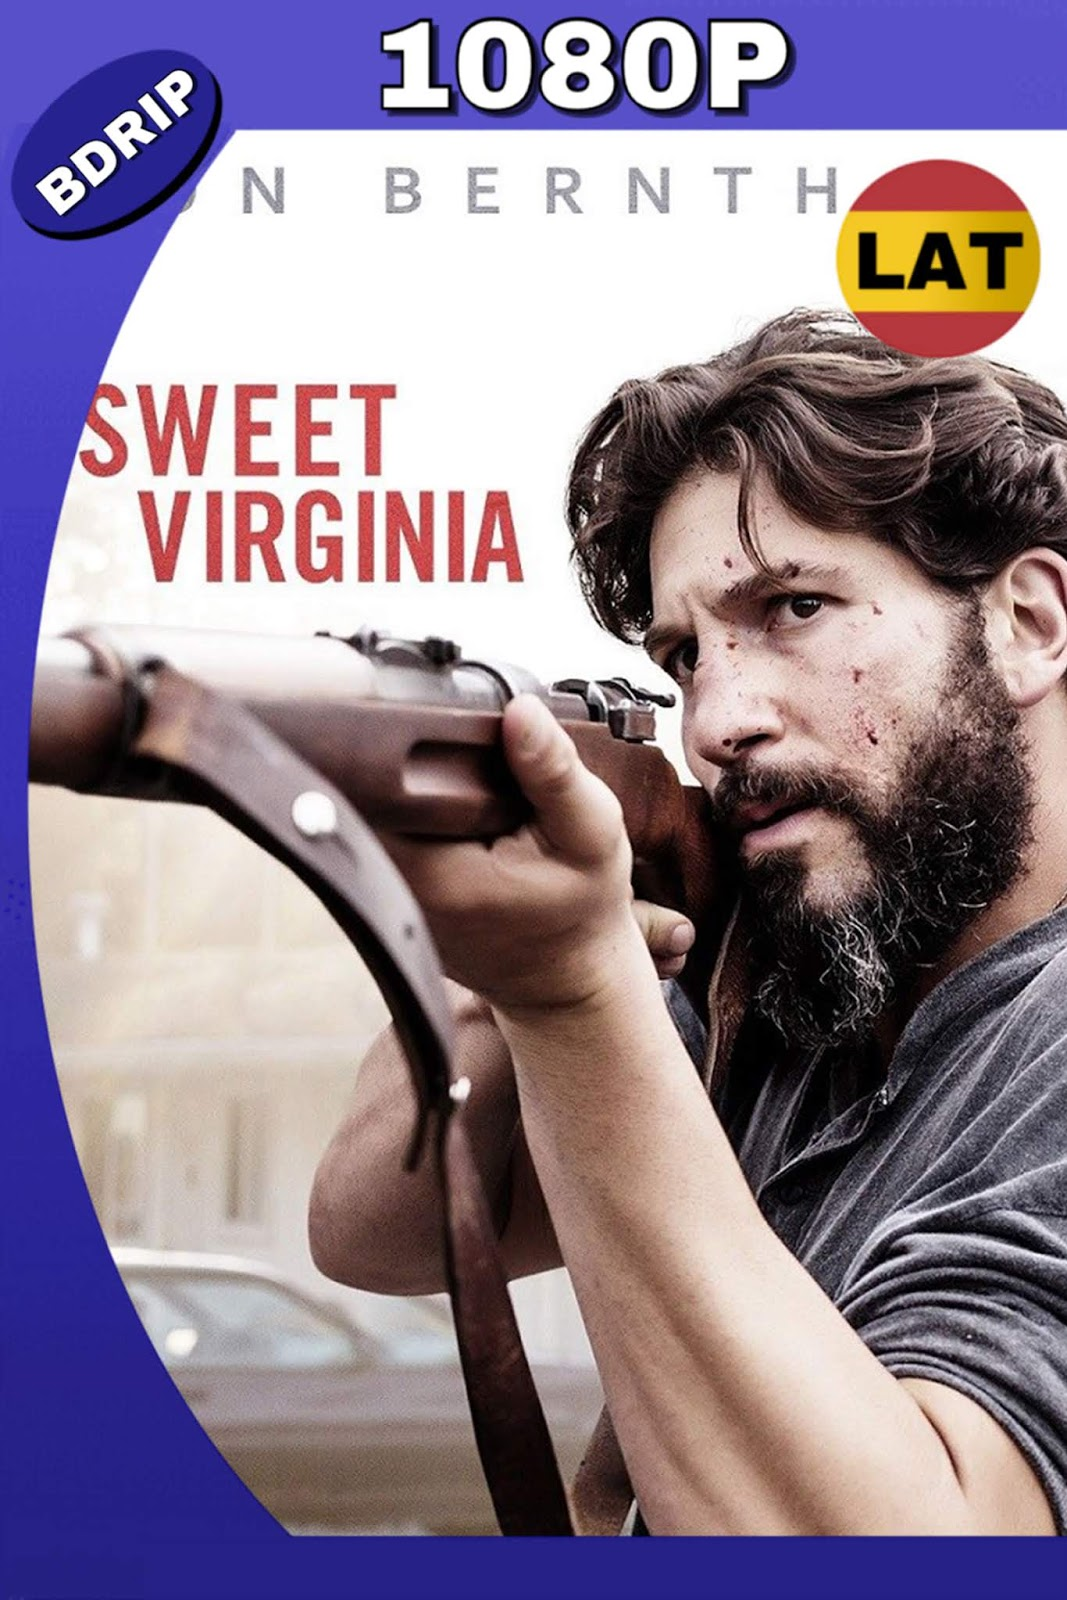 SWEET VIRGINIA 2017 HD BDRIP 1080P 8GB.mkv